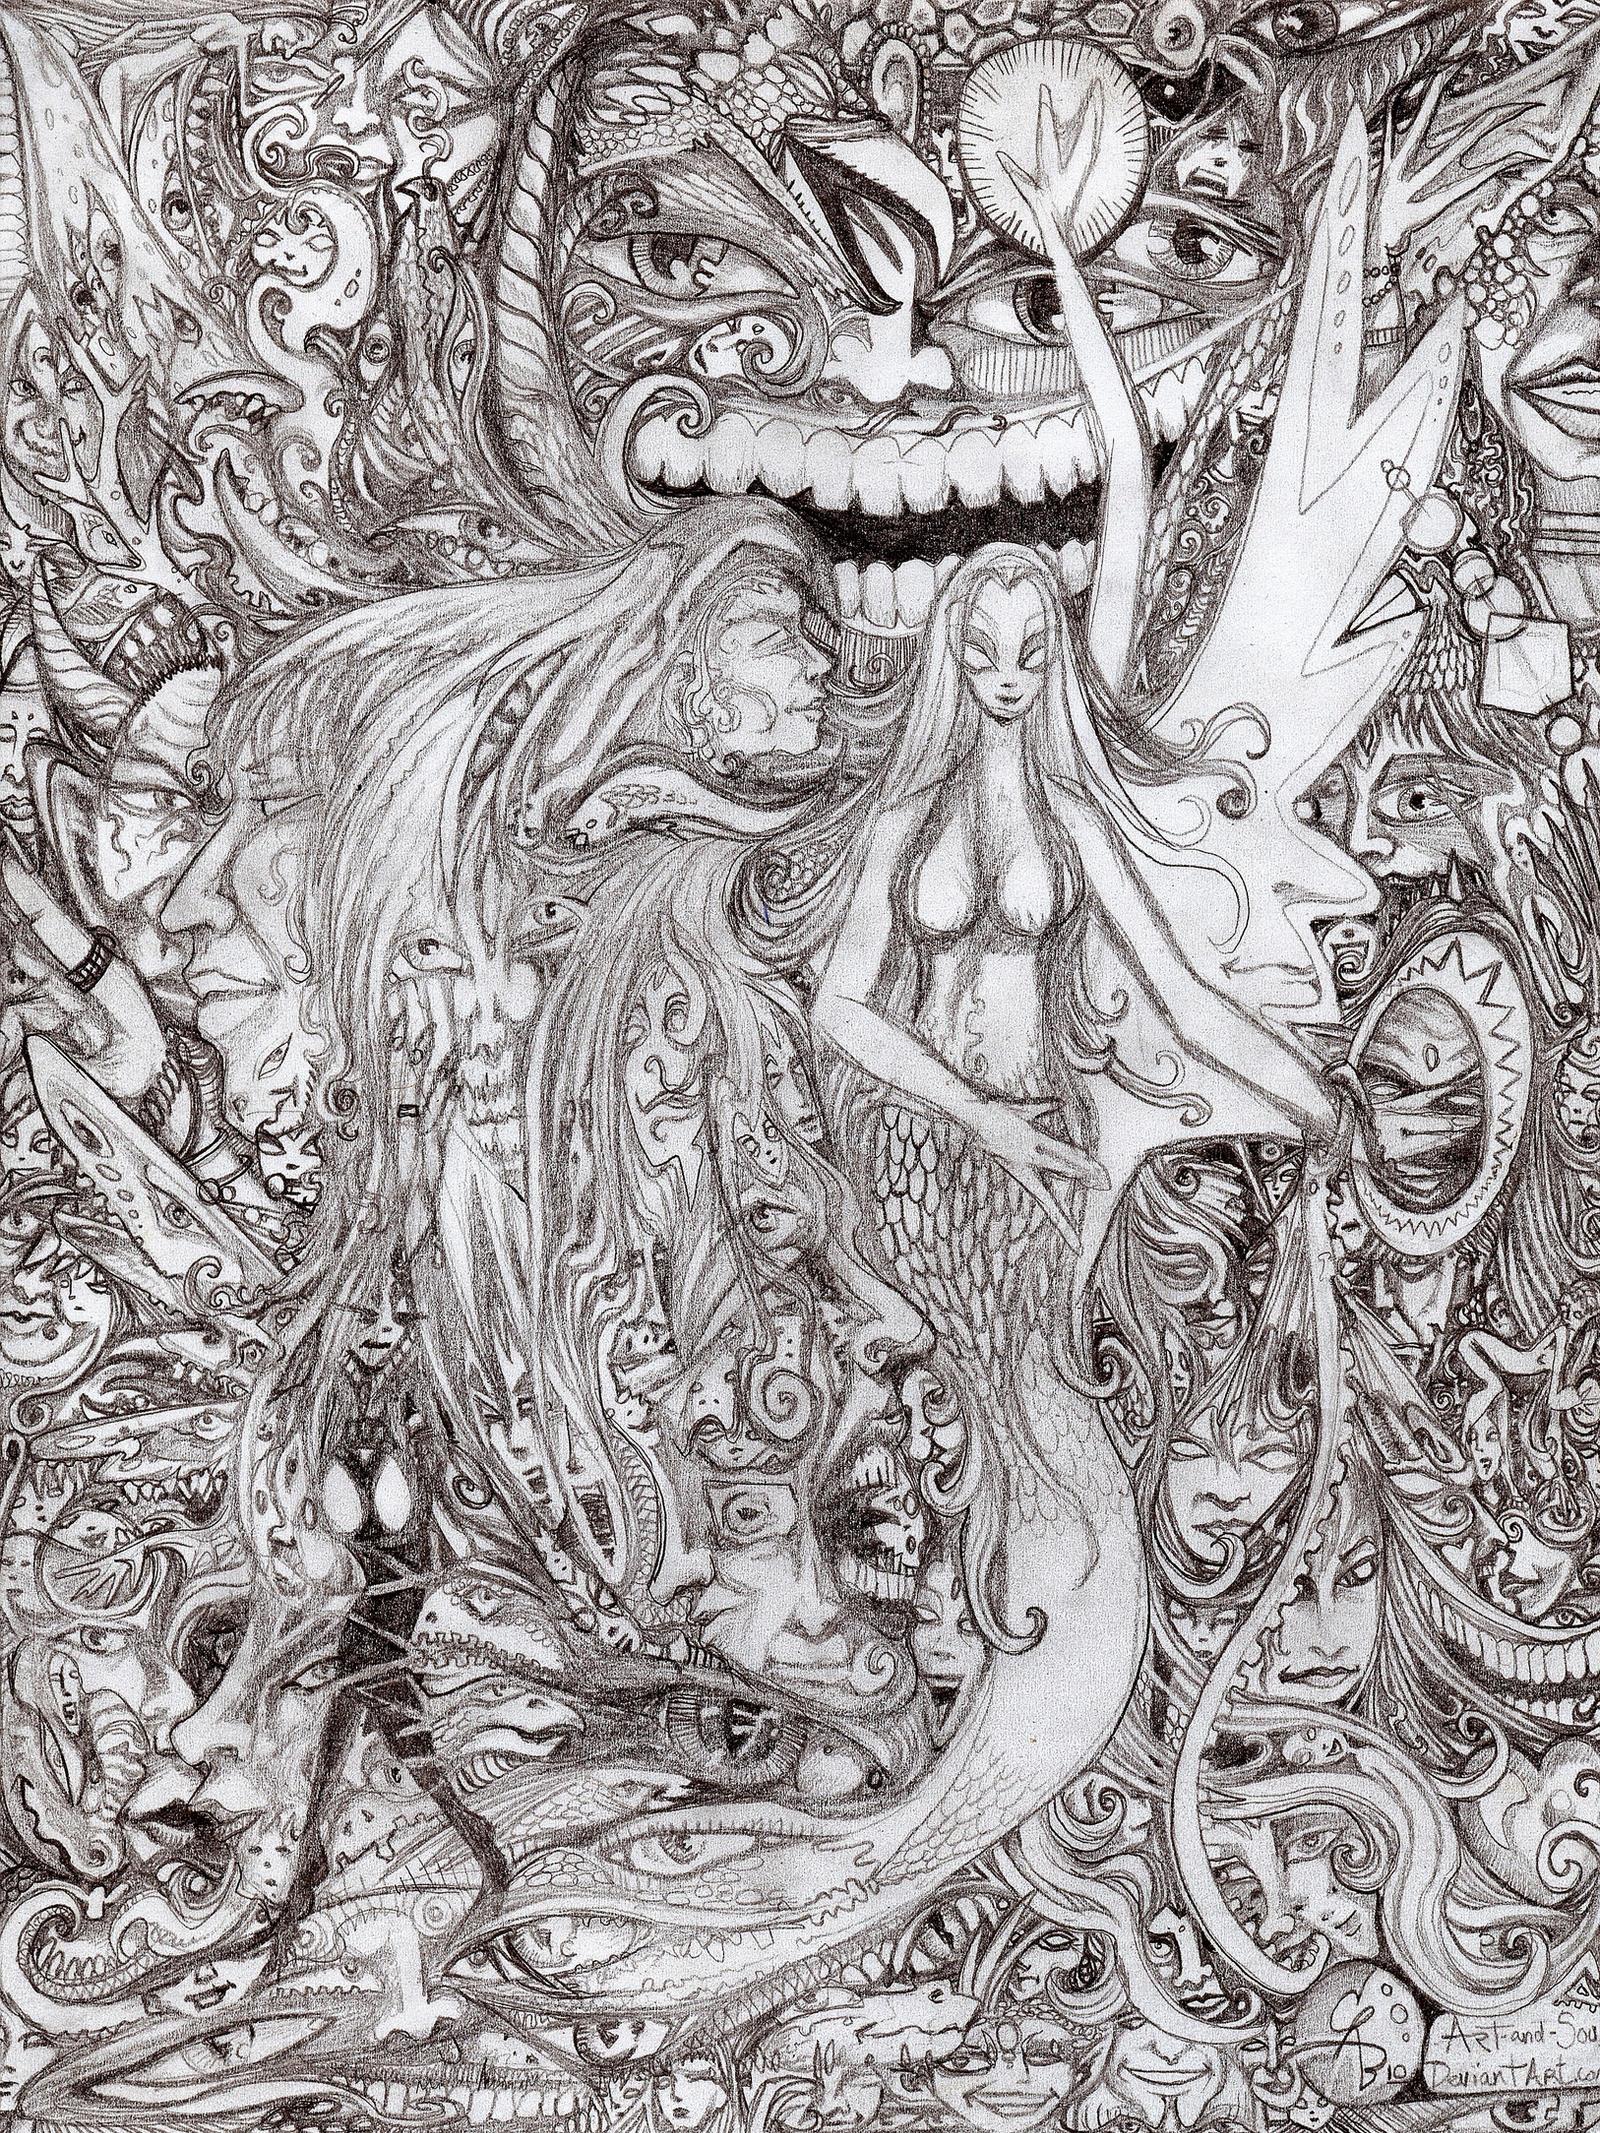 My insane pencil by CReevesABudd